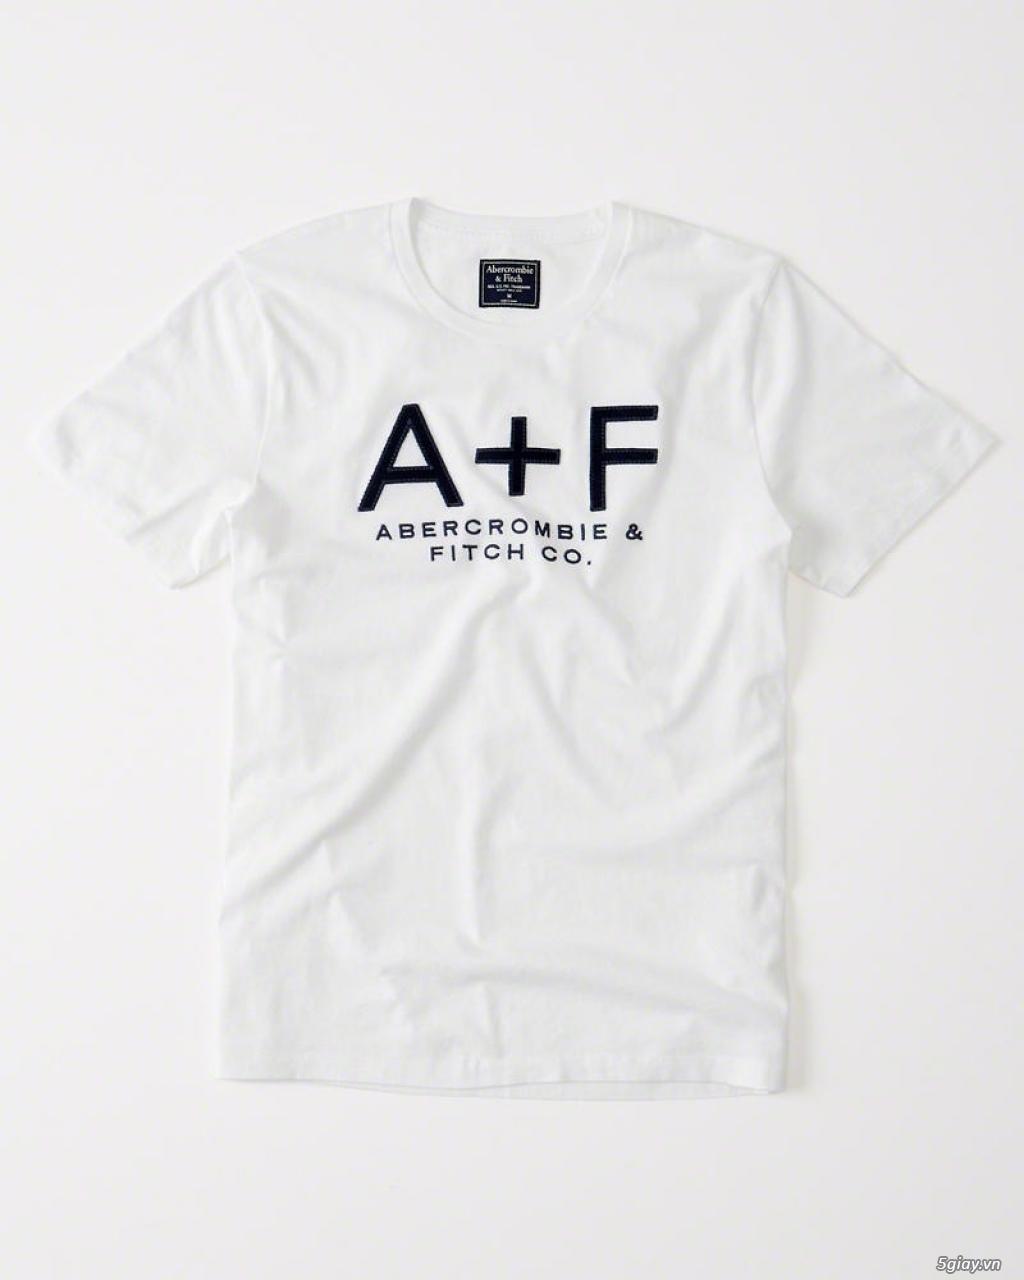 [ Lamanshop.com ]- Quần áo HOLLISTER - ABERCROMBIE & FITCH - Chính hãng USA 100% - 3